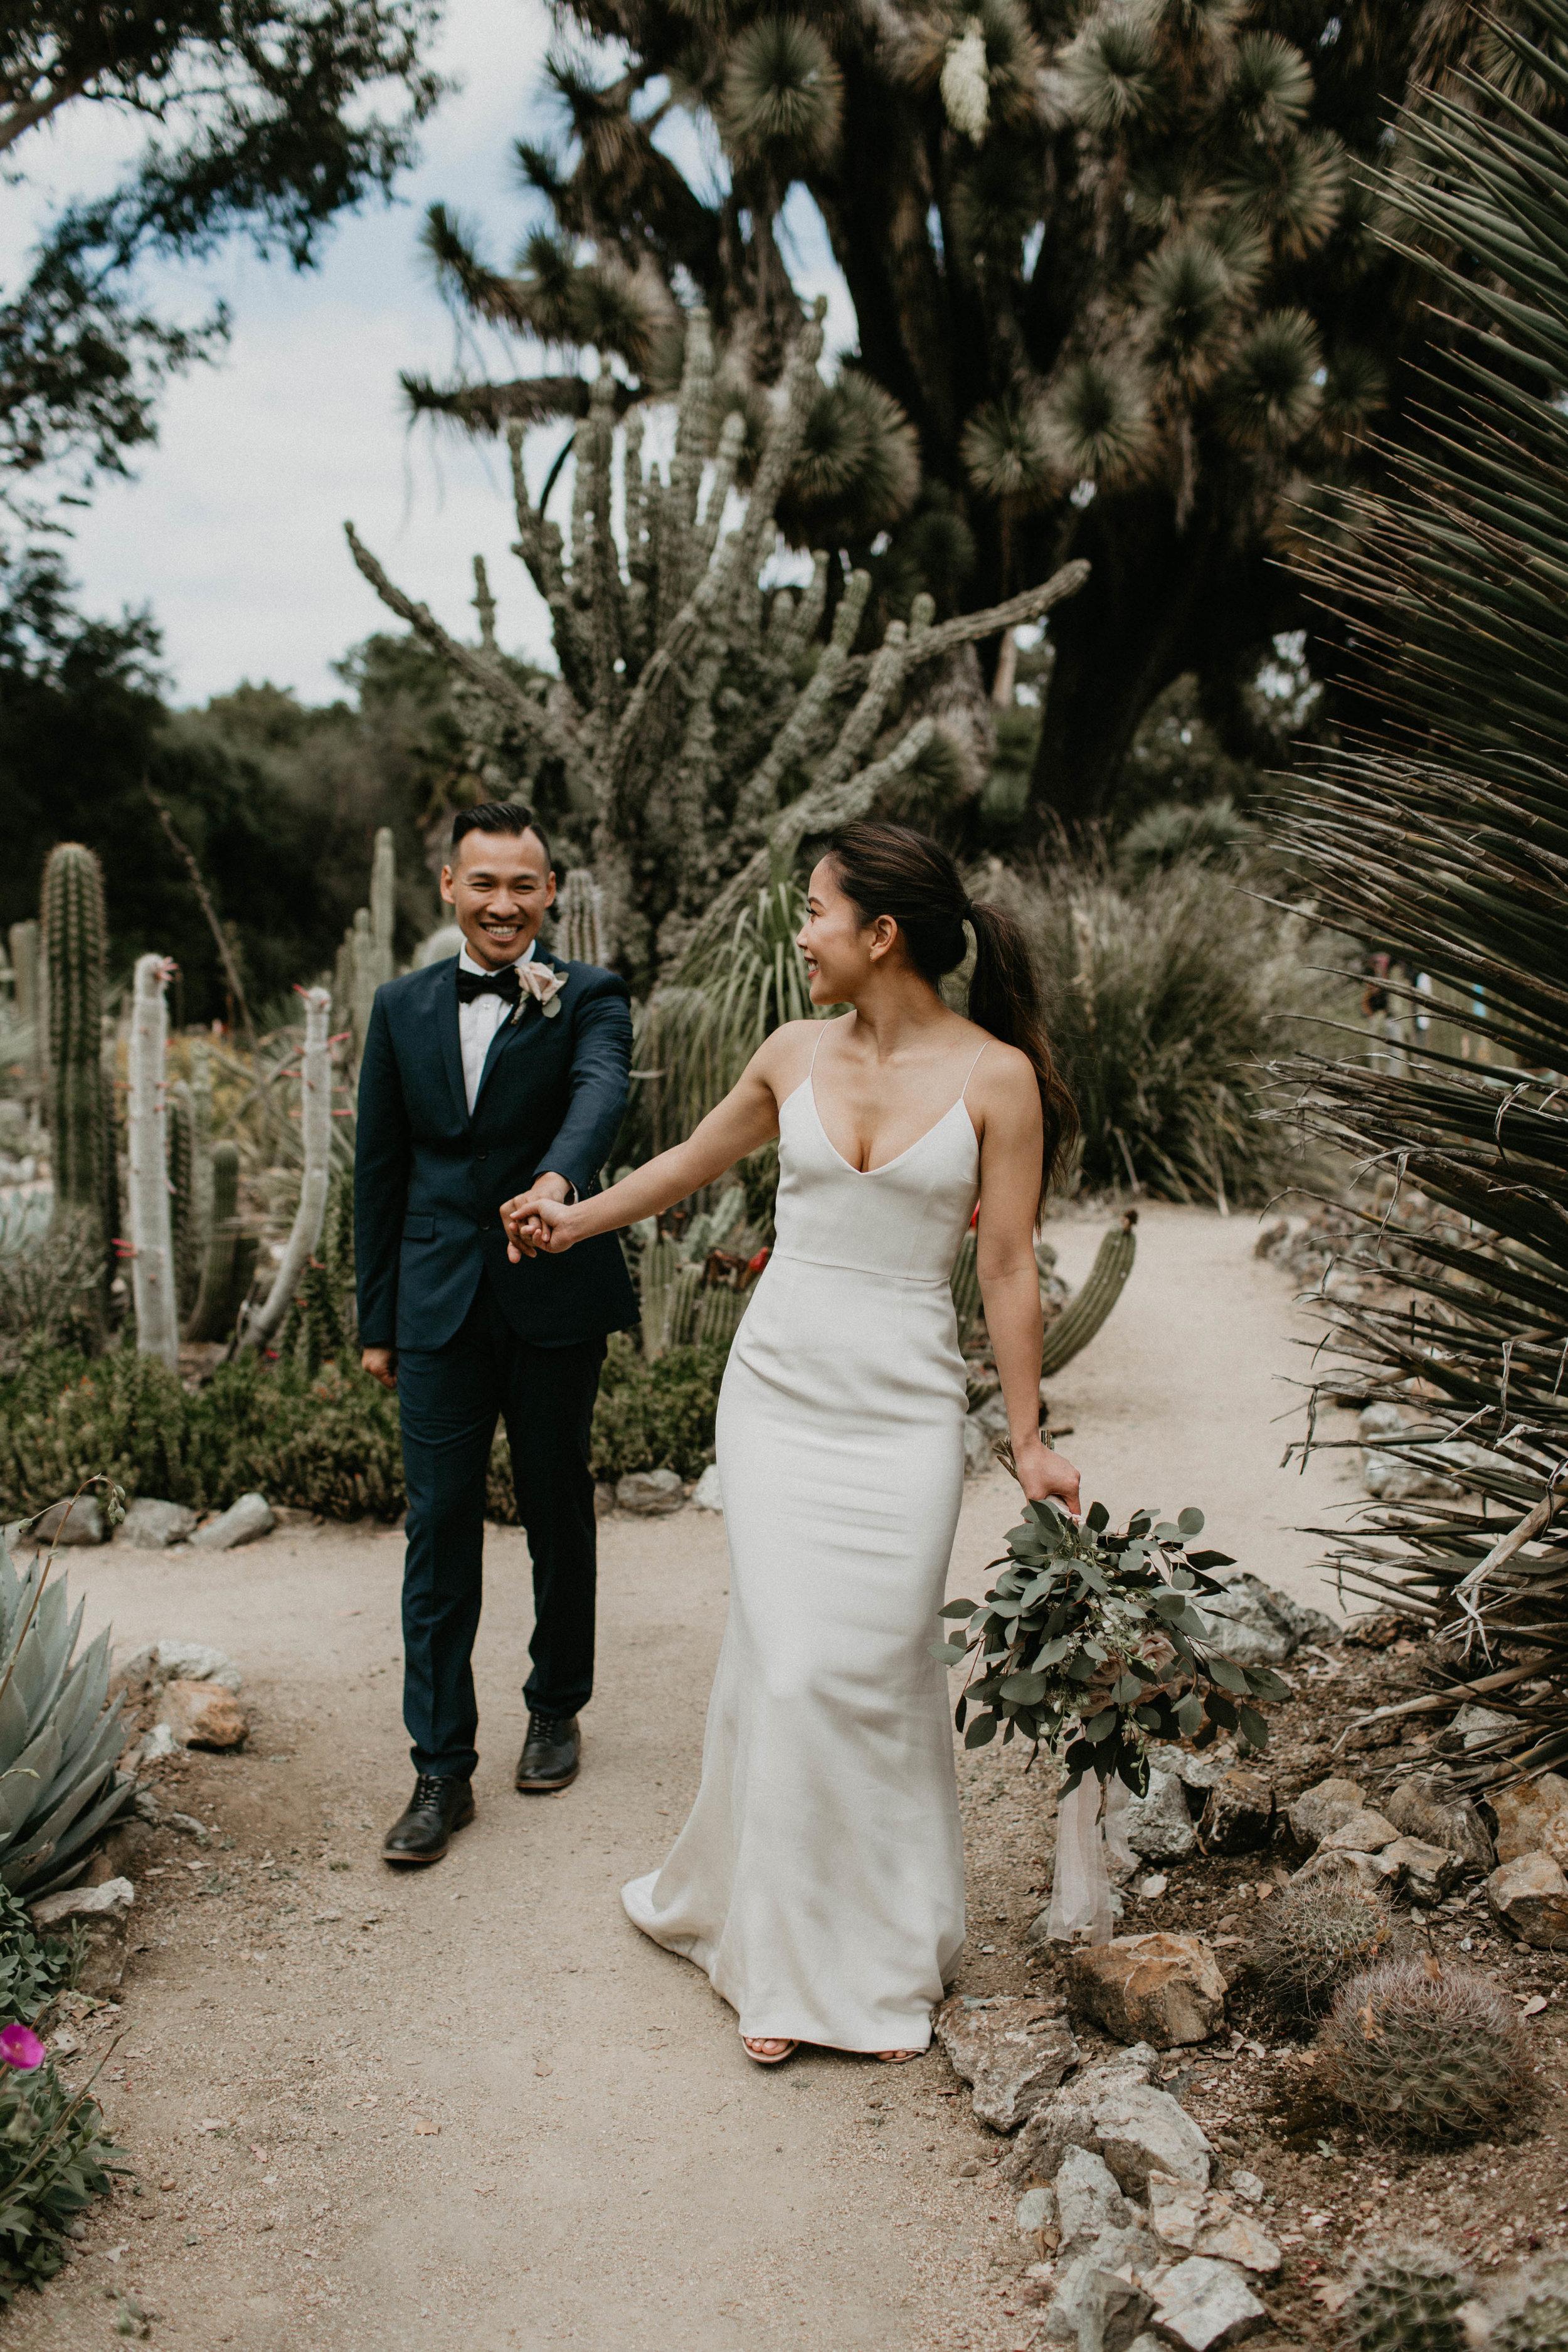 California Church Wedding by Michelle Larmand photography